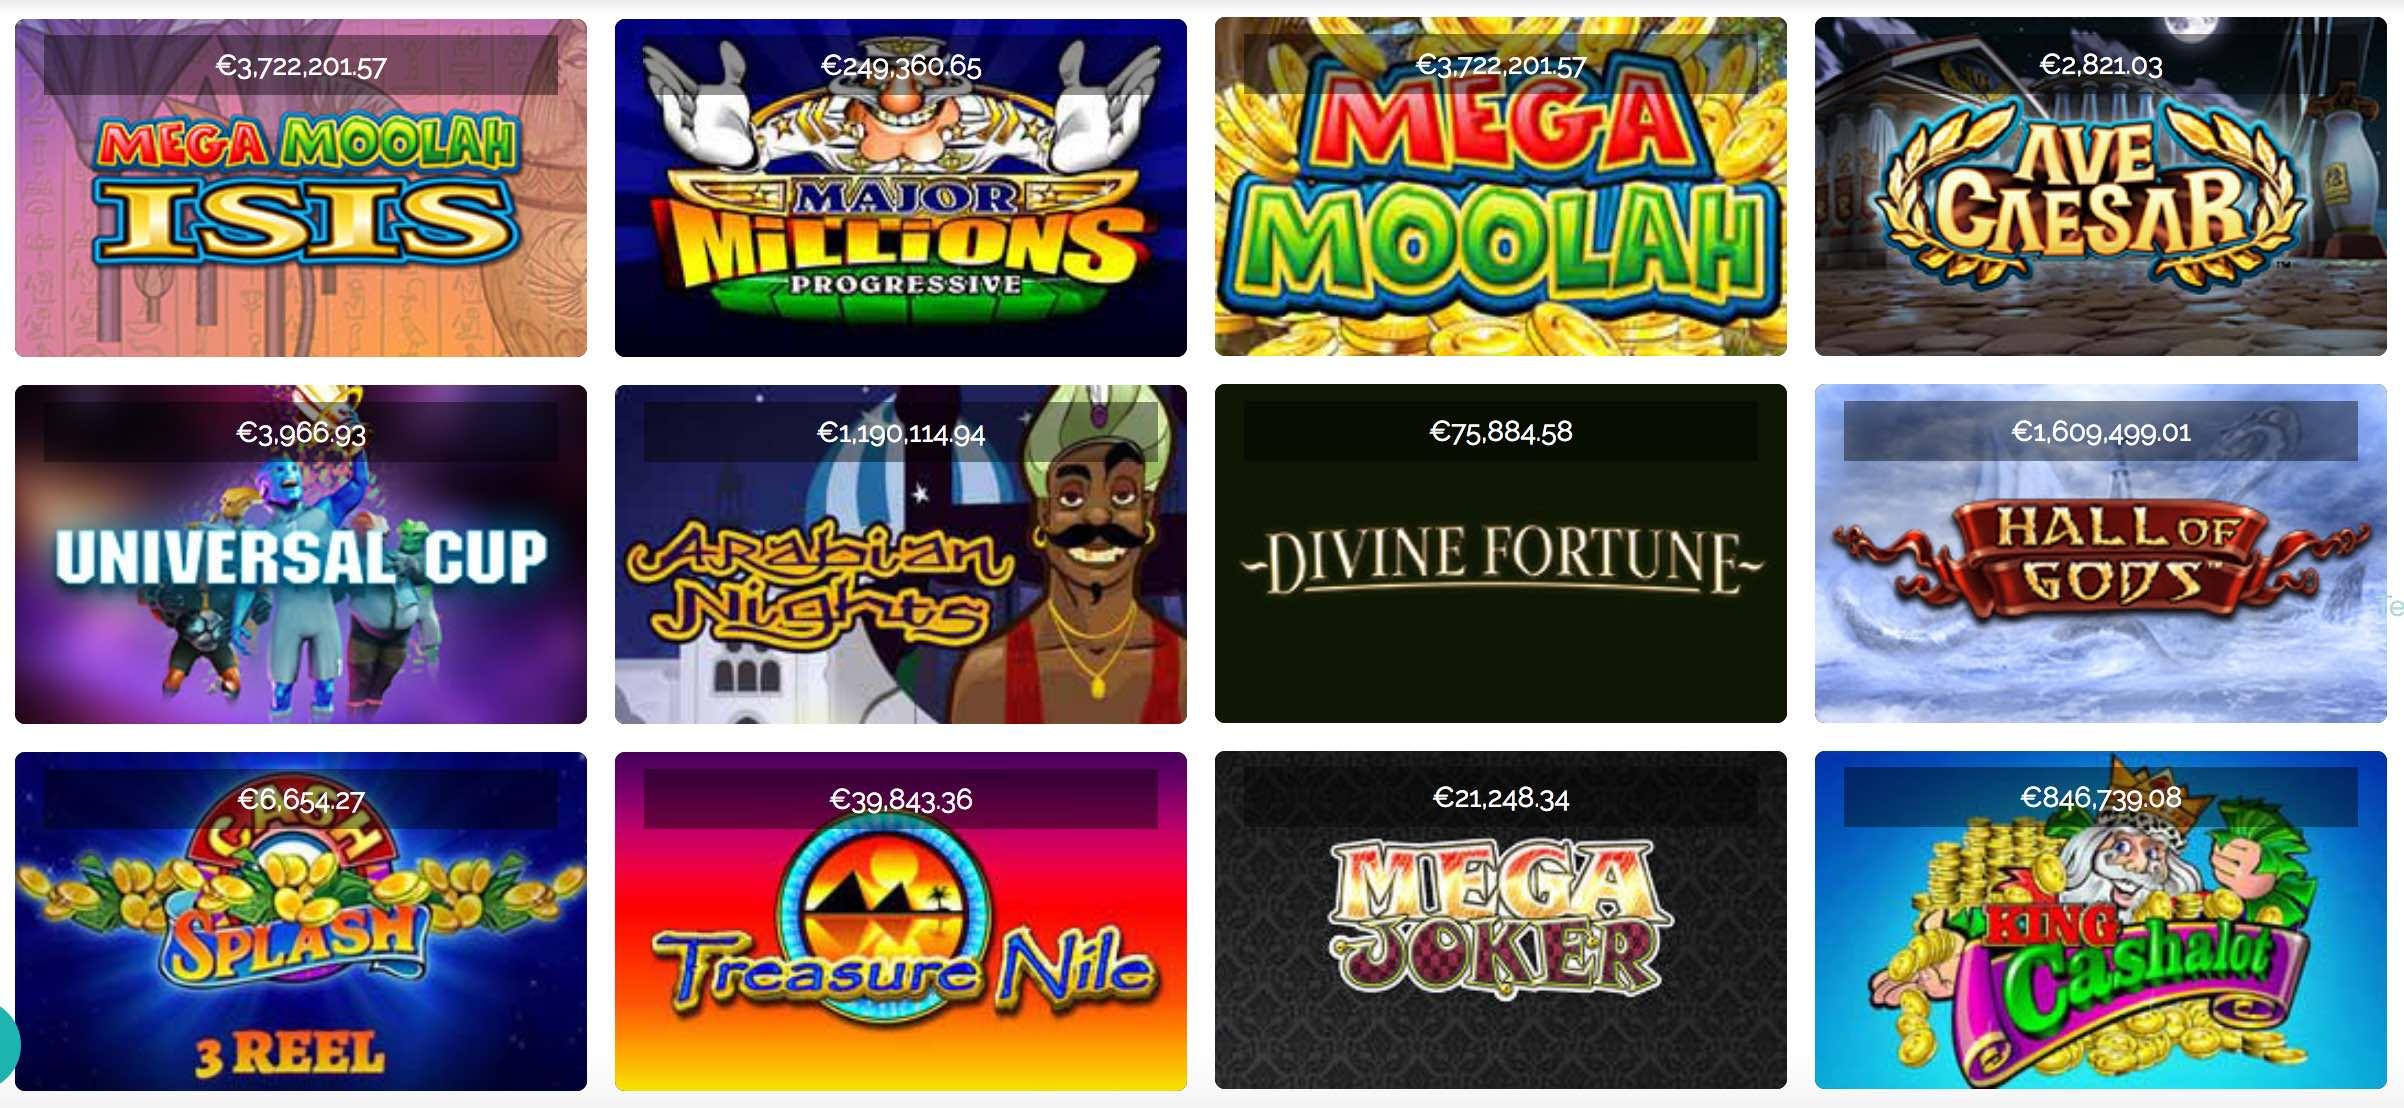 Progressibe Jackpot Slots & Spielautomaten